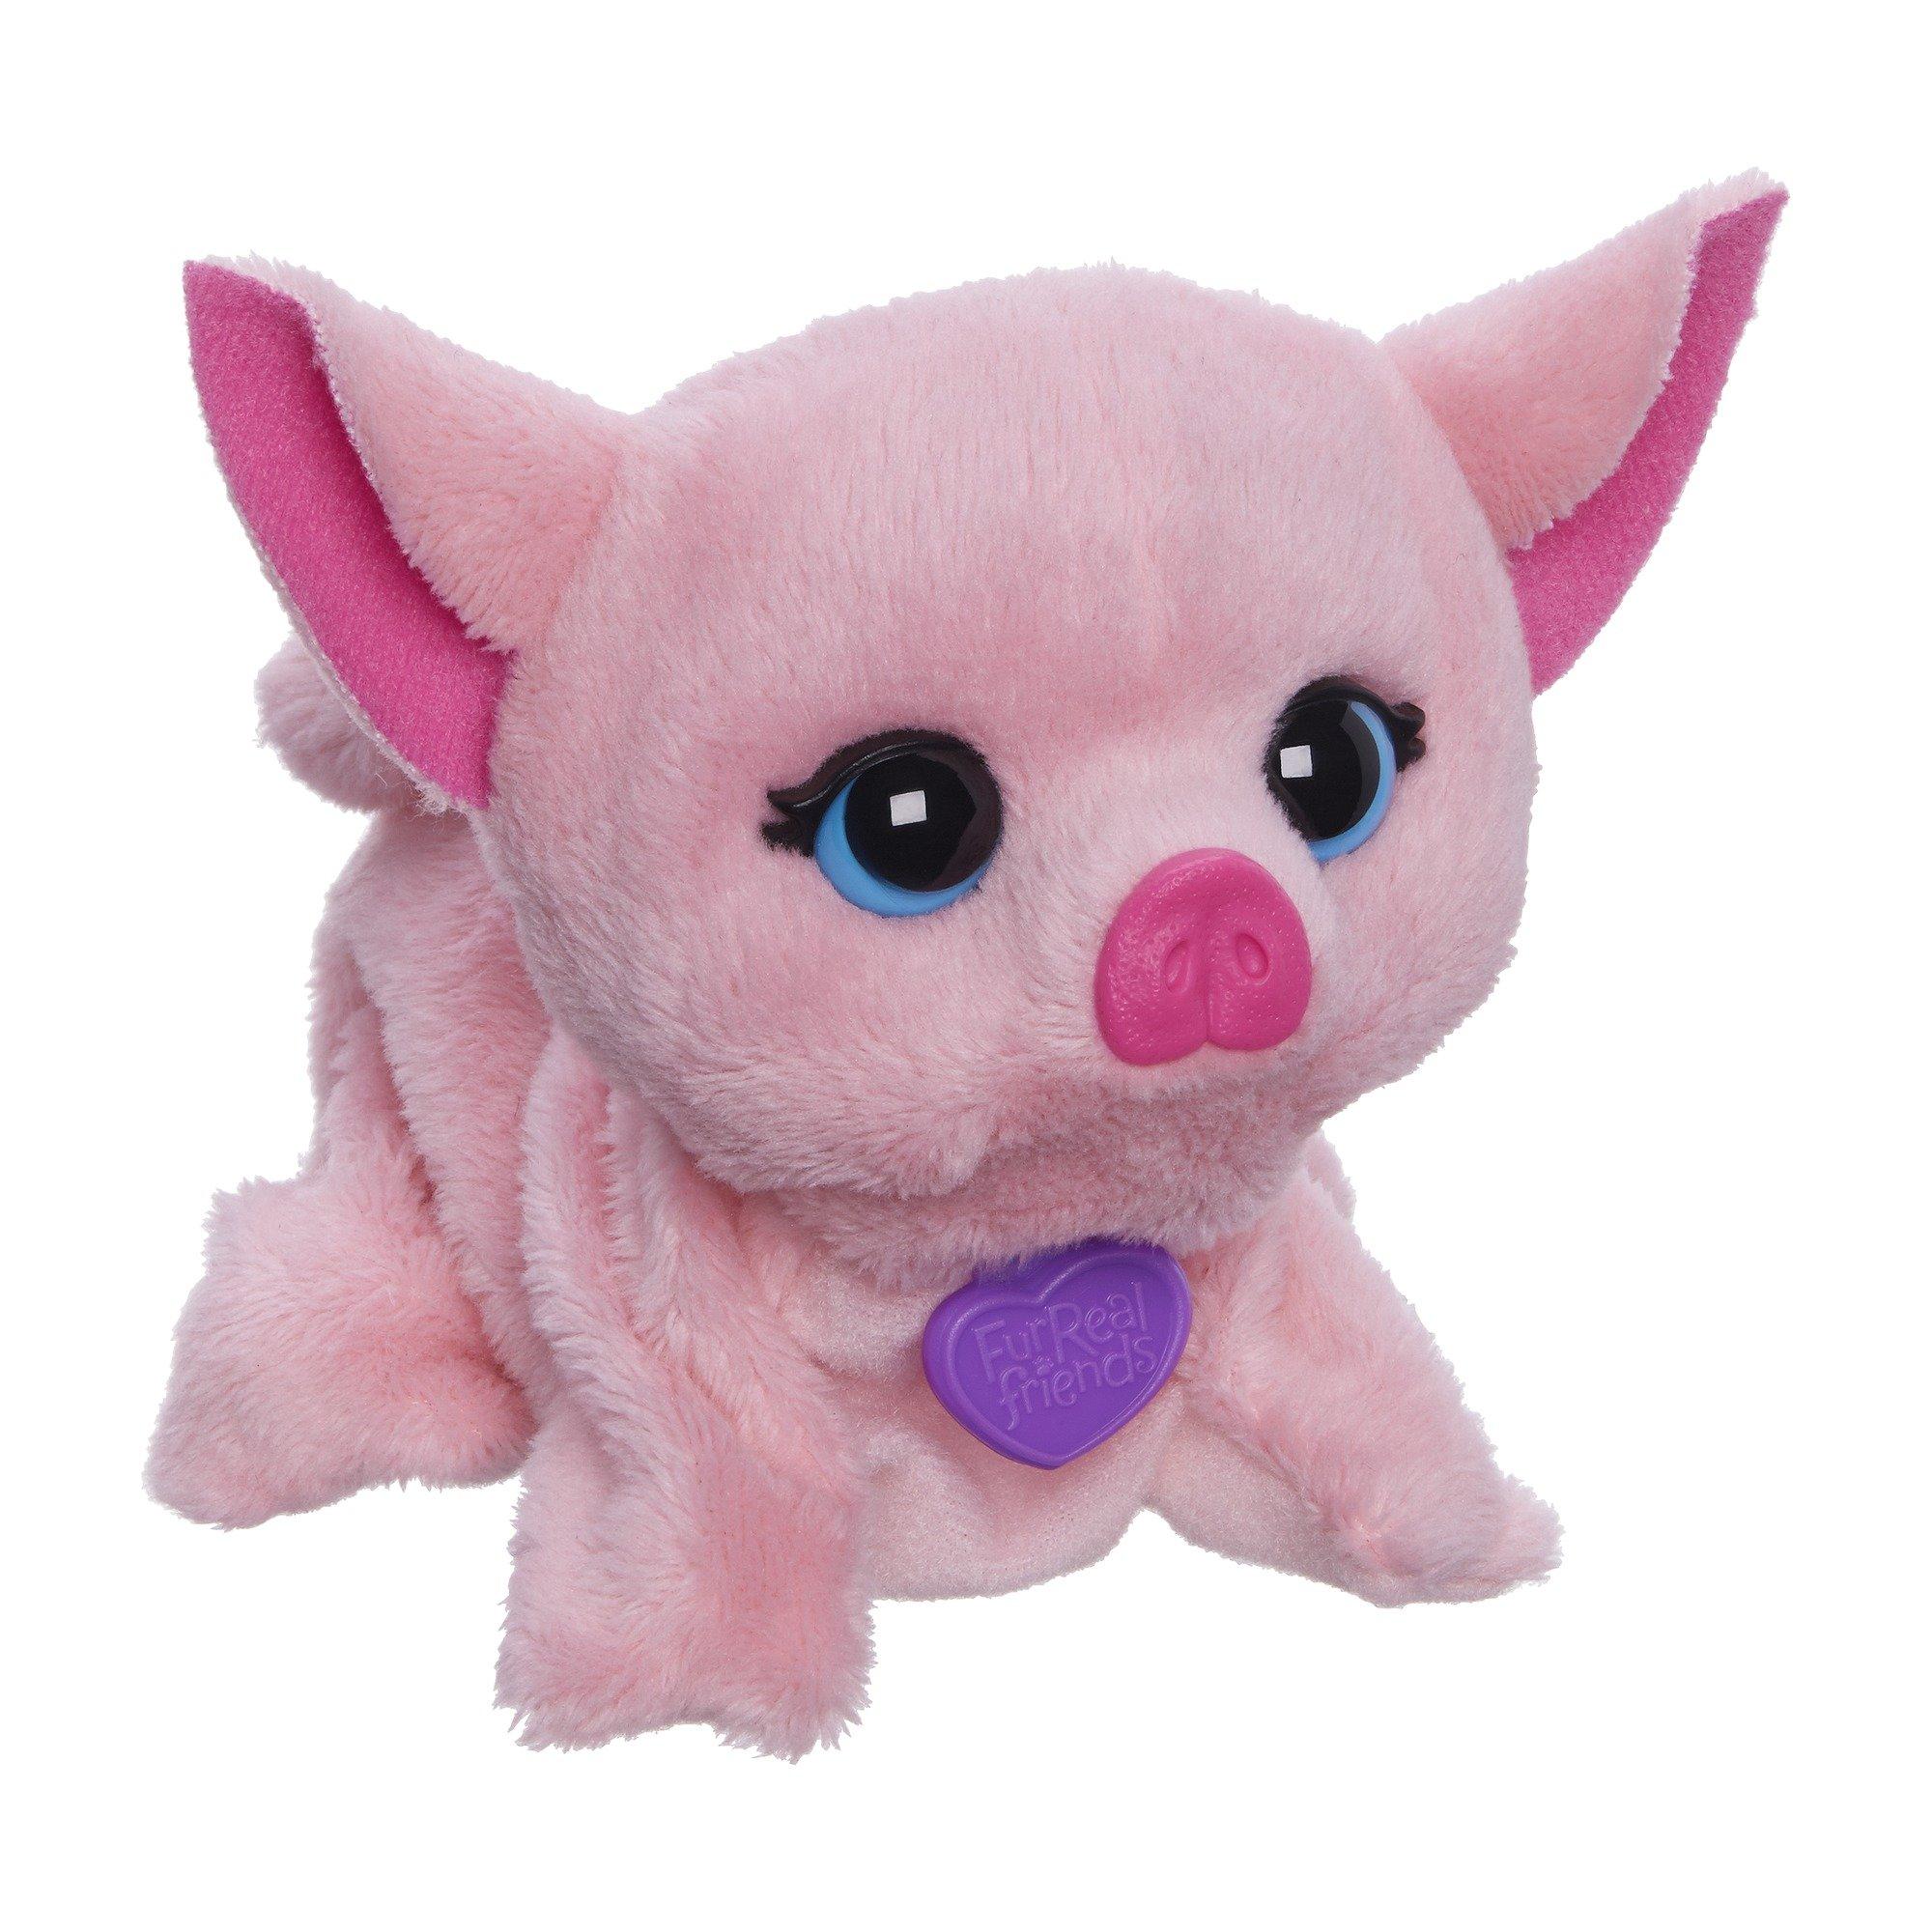 FurReal friends Luvimals Sweet Singin' Pig Pet Toy